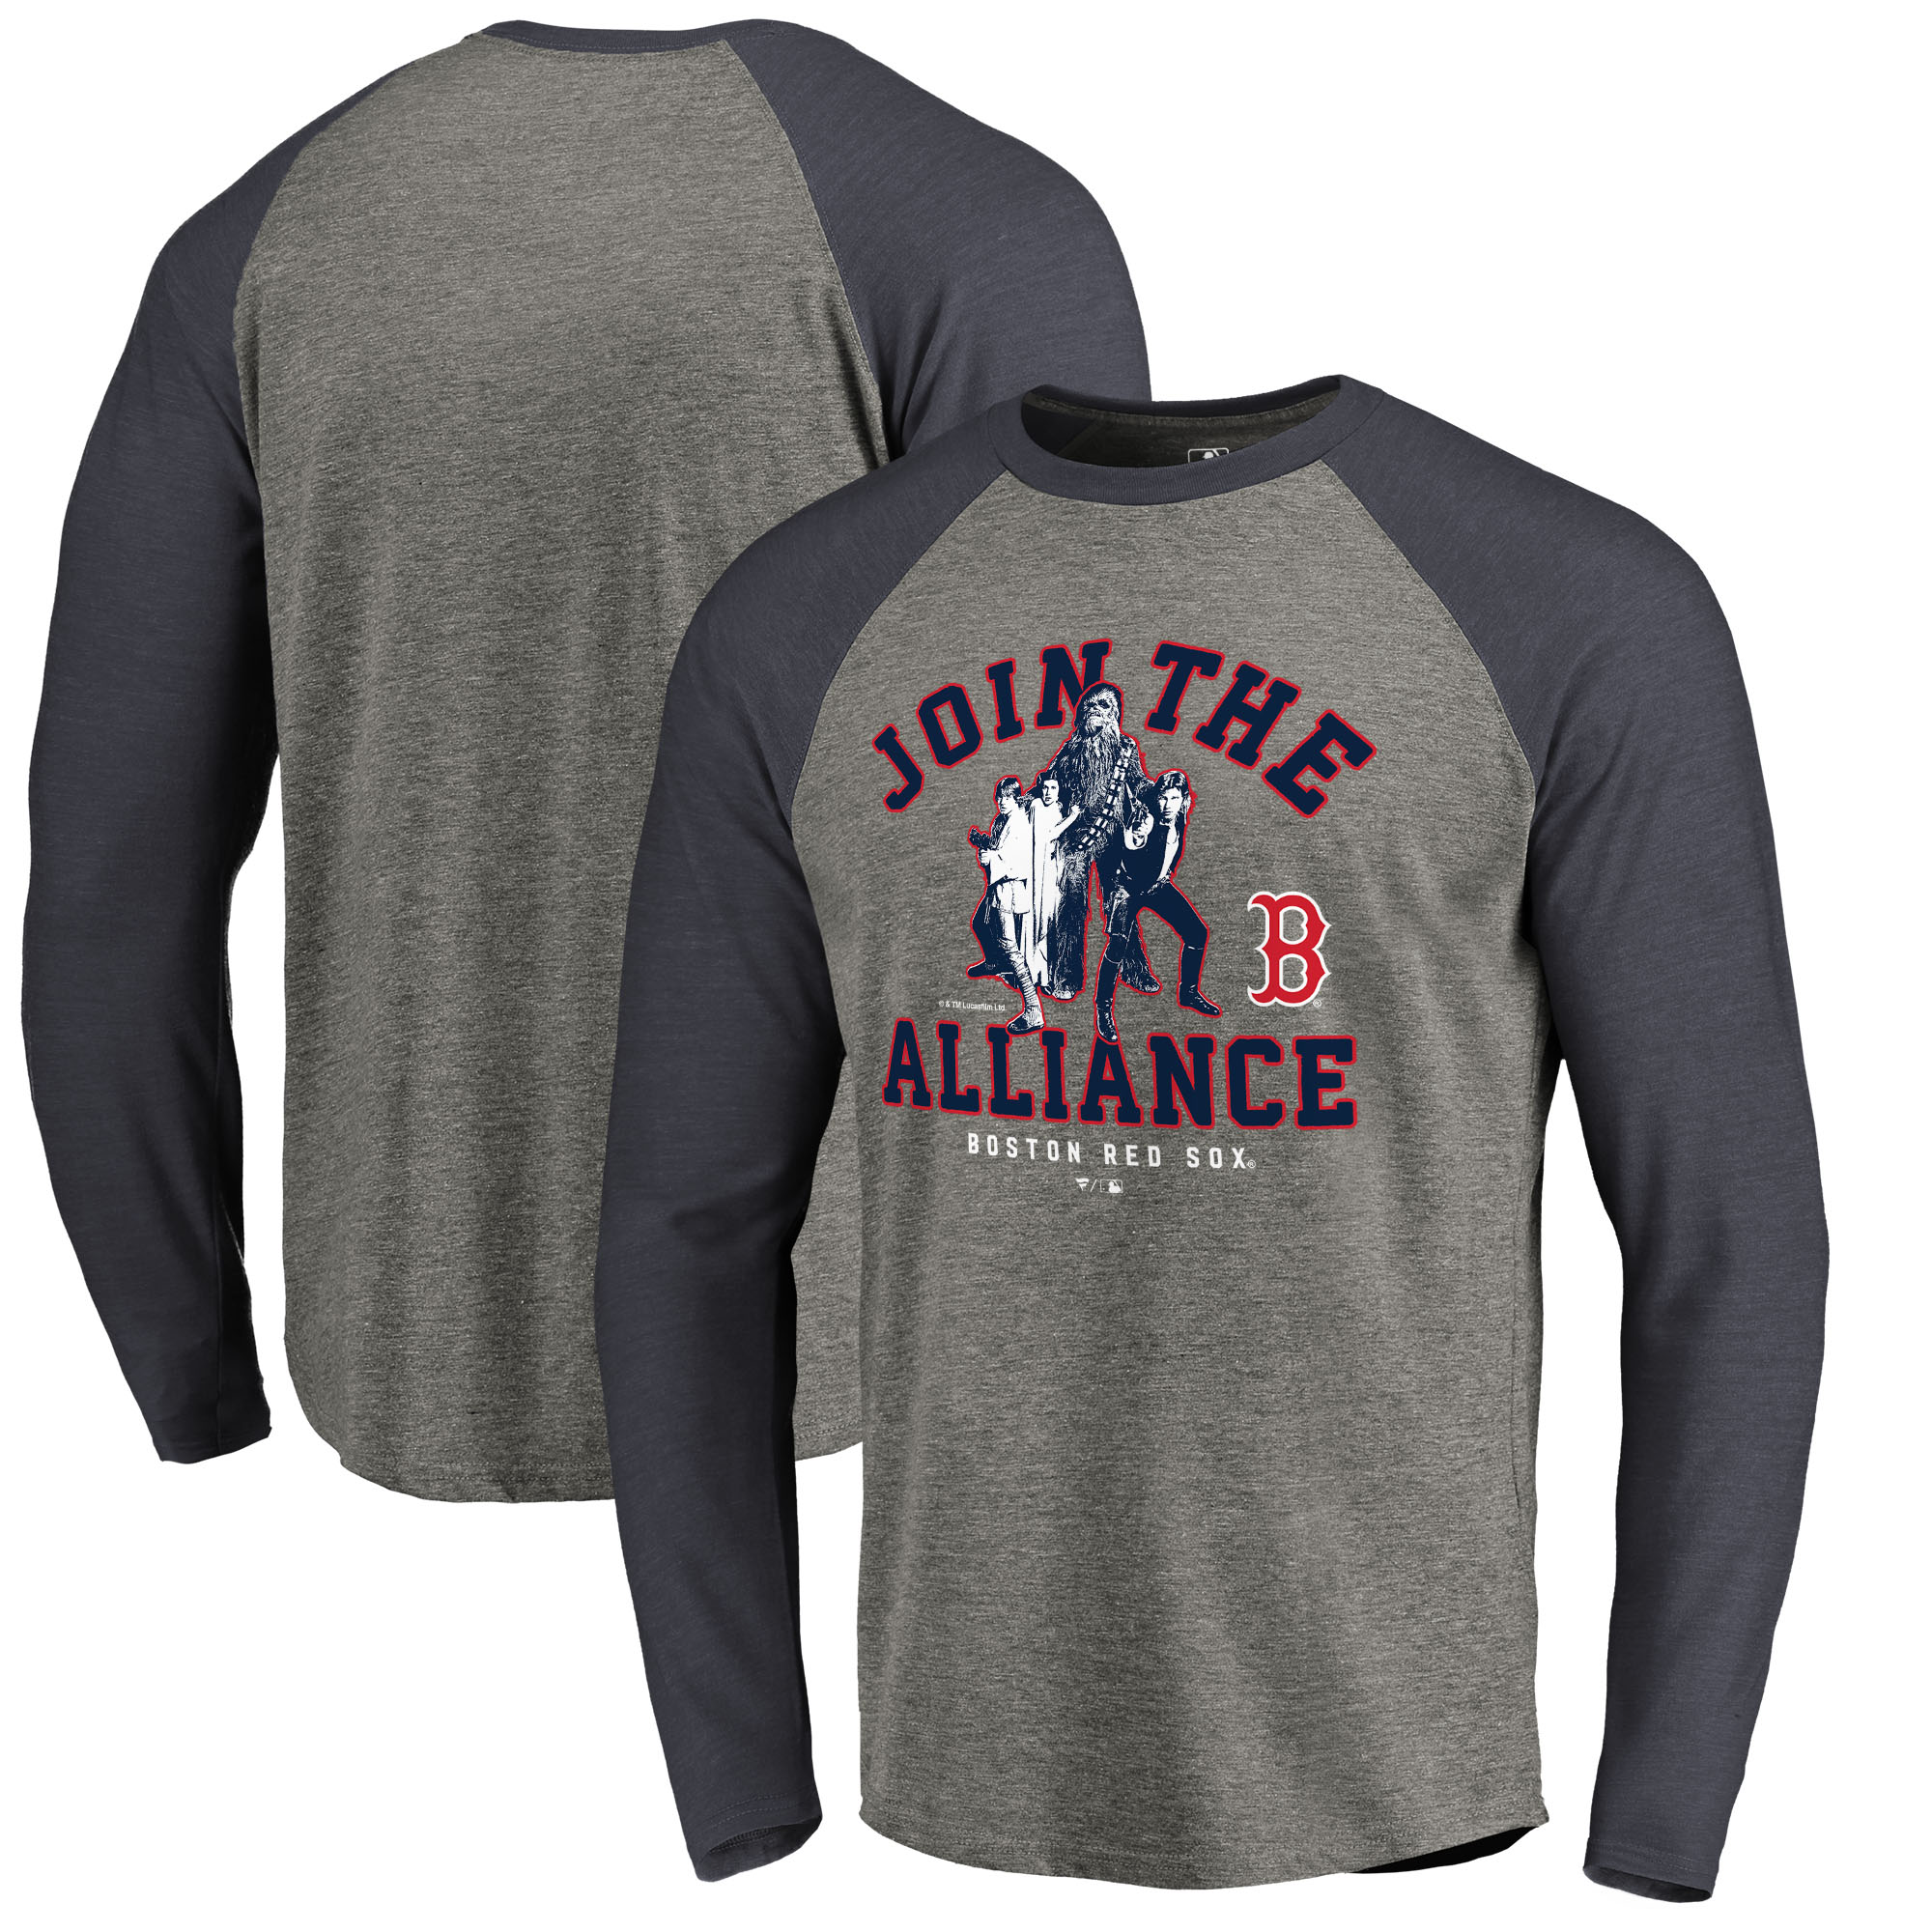 Boston Red Sox Fanatics Branded MLB Star Wars Join The Alliance Raglan Long Sleeve T-Shirt - Heather Gray